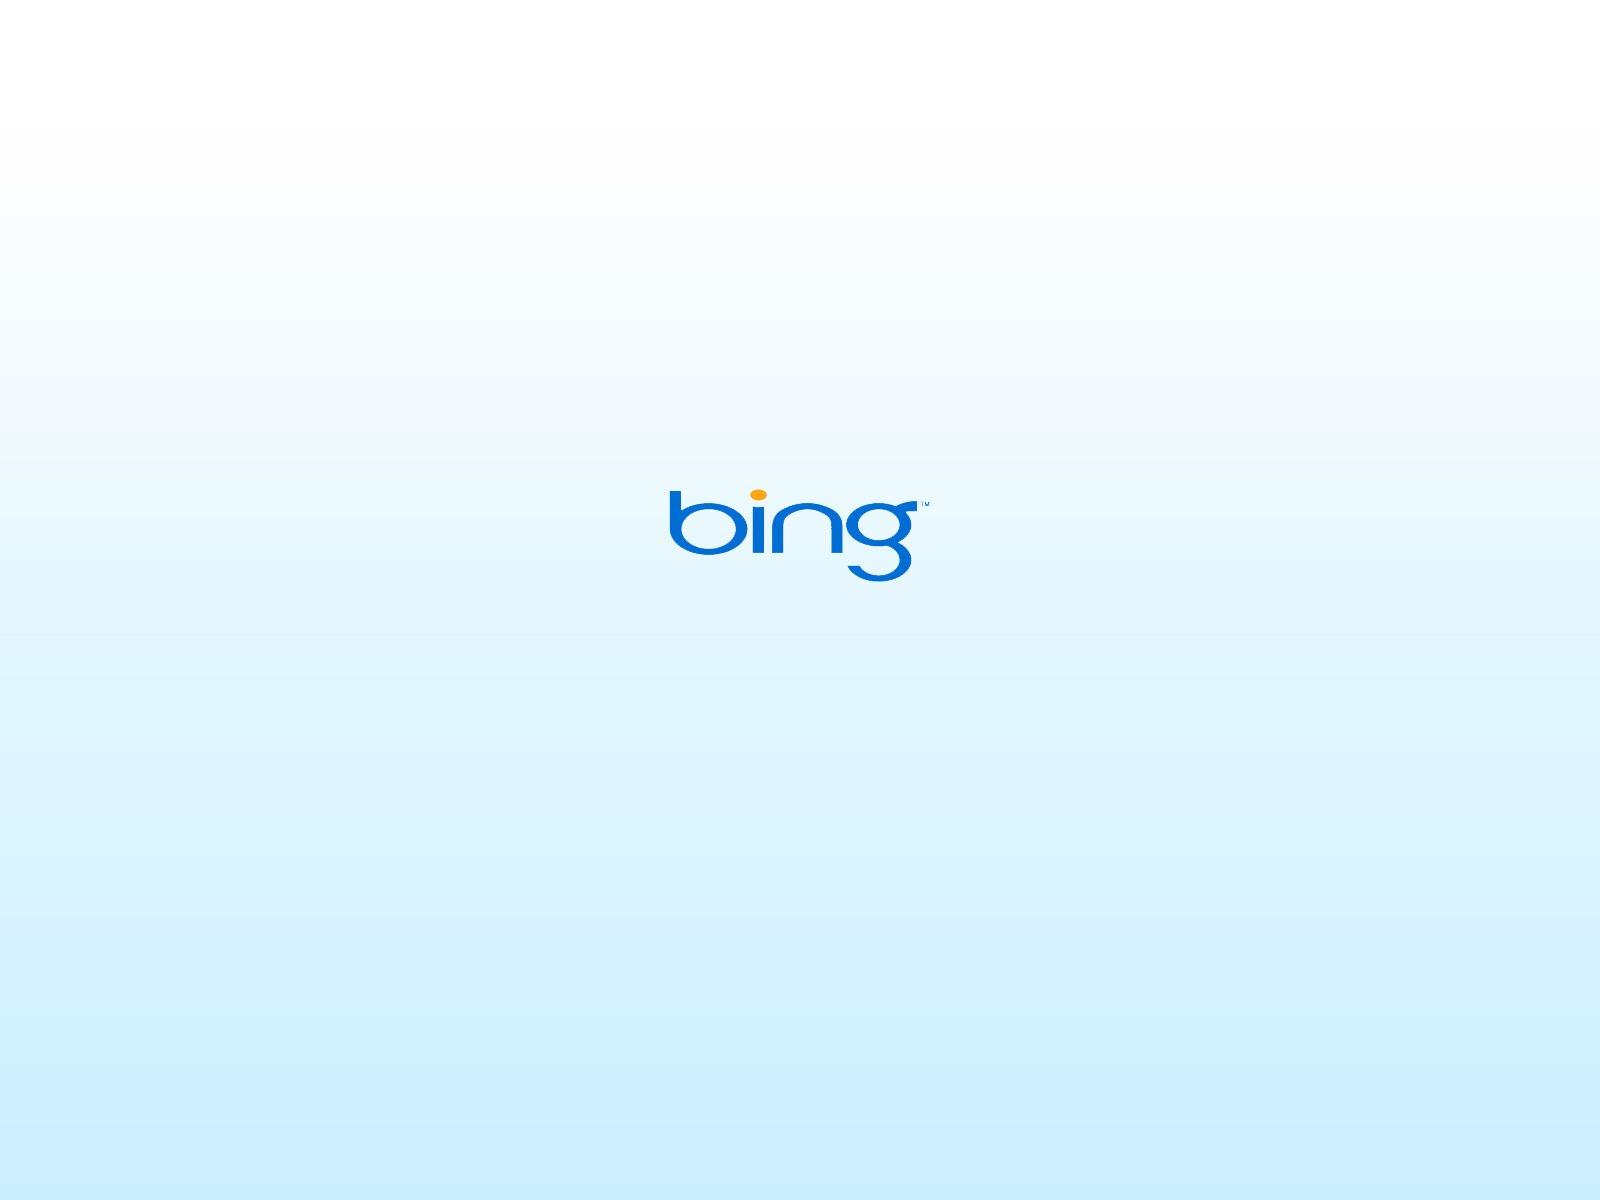 bing animated desktop wallpaper - photo #37